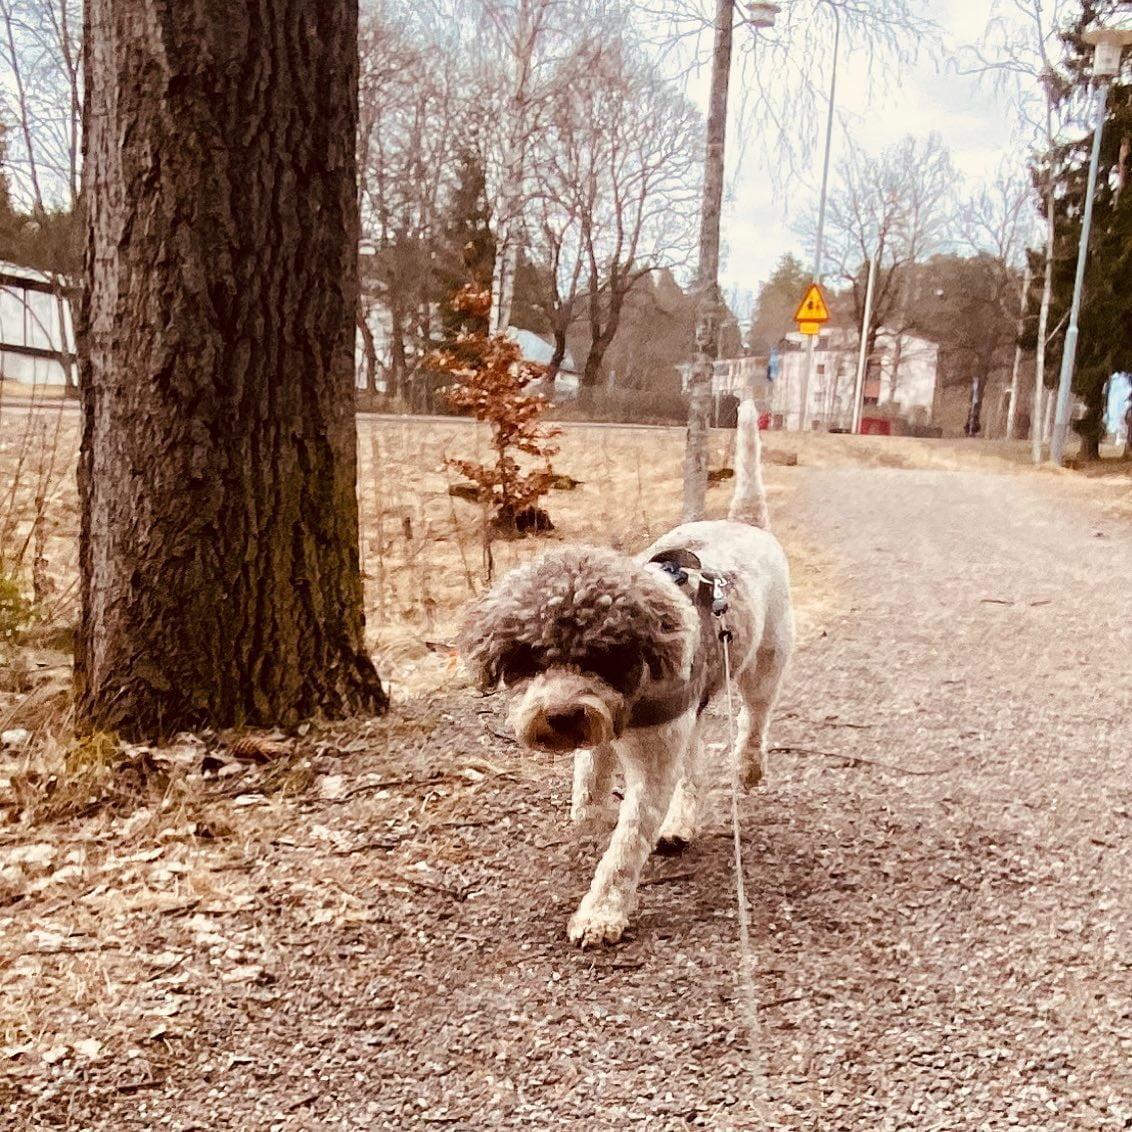 Ok. This is my road. It's mine. #lagottosofinstagram #lagottopuppy #italianwaterdog #truffledog  #lagottoromagnolo_daily #happydoglife #Lagotto #Dogs #DogsOfInstagram #Petstagram #Pets #Dogstagram #MyLife #MyDailyLife #PappaJagVillHaEnItalienare  #MacLagotto #Falun #Sweden @knappare @liminglindblad @k.rowntree @taxen_coco @h3lvetesjavlar This was posted by my Dad: @kristerlindholmfalun